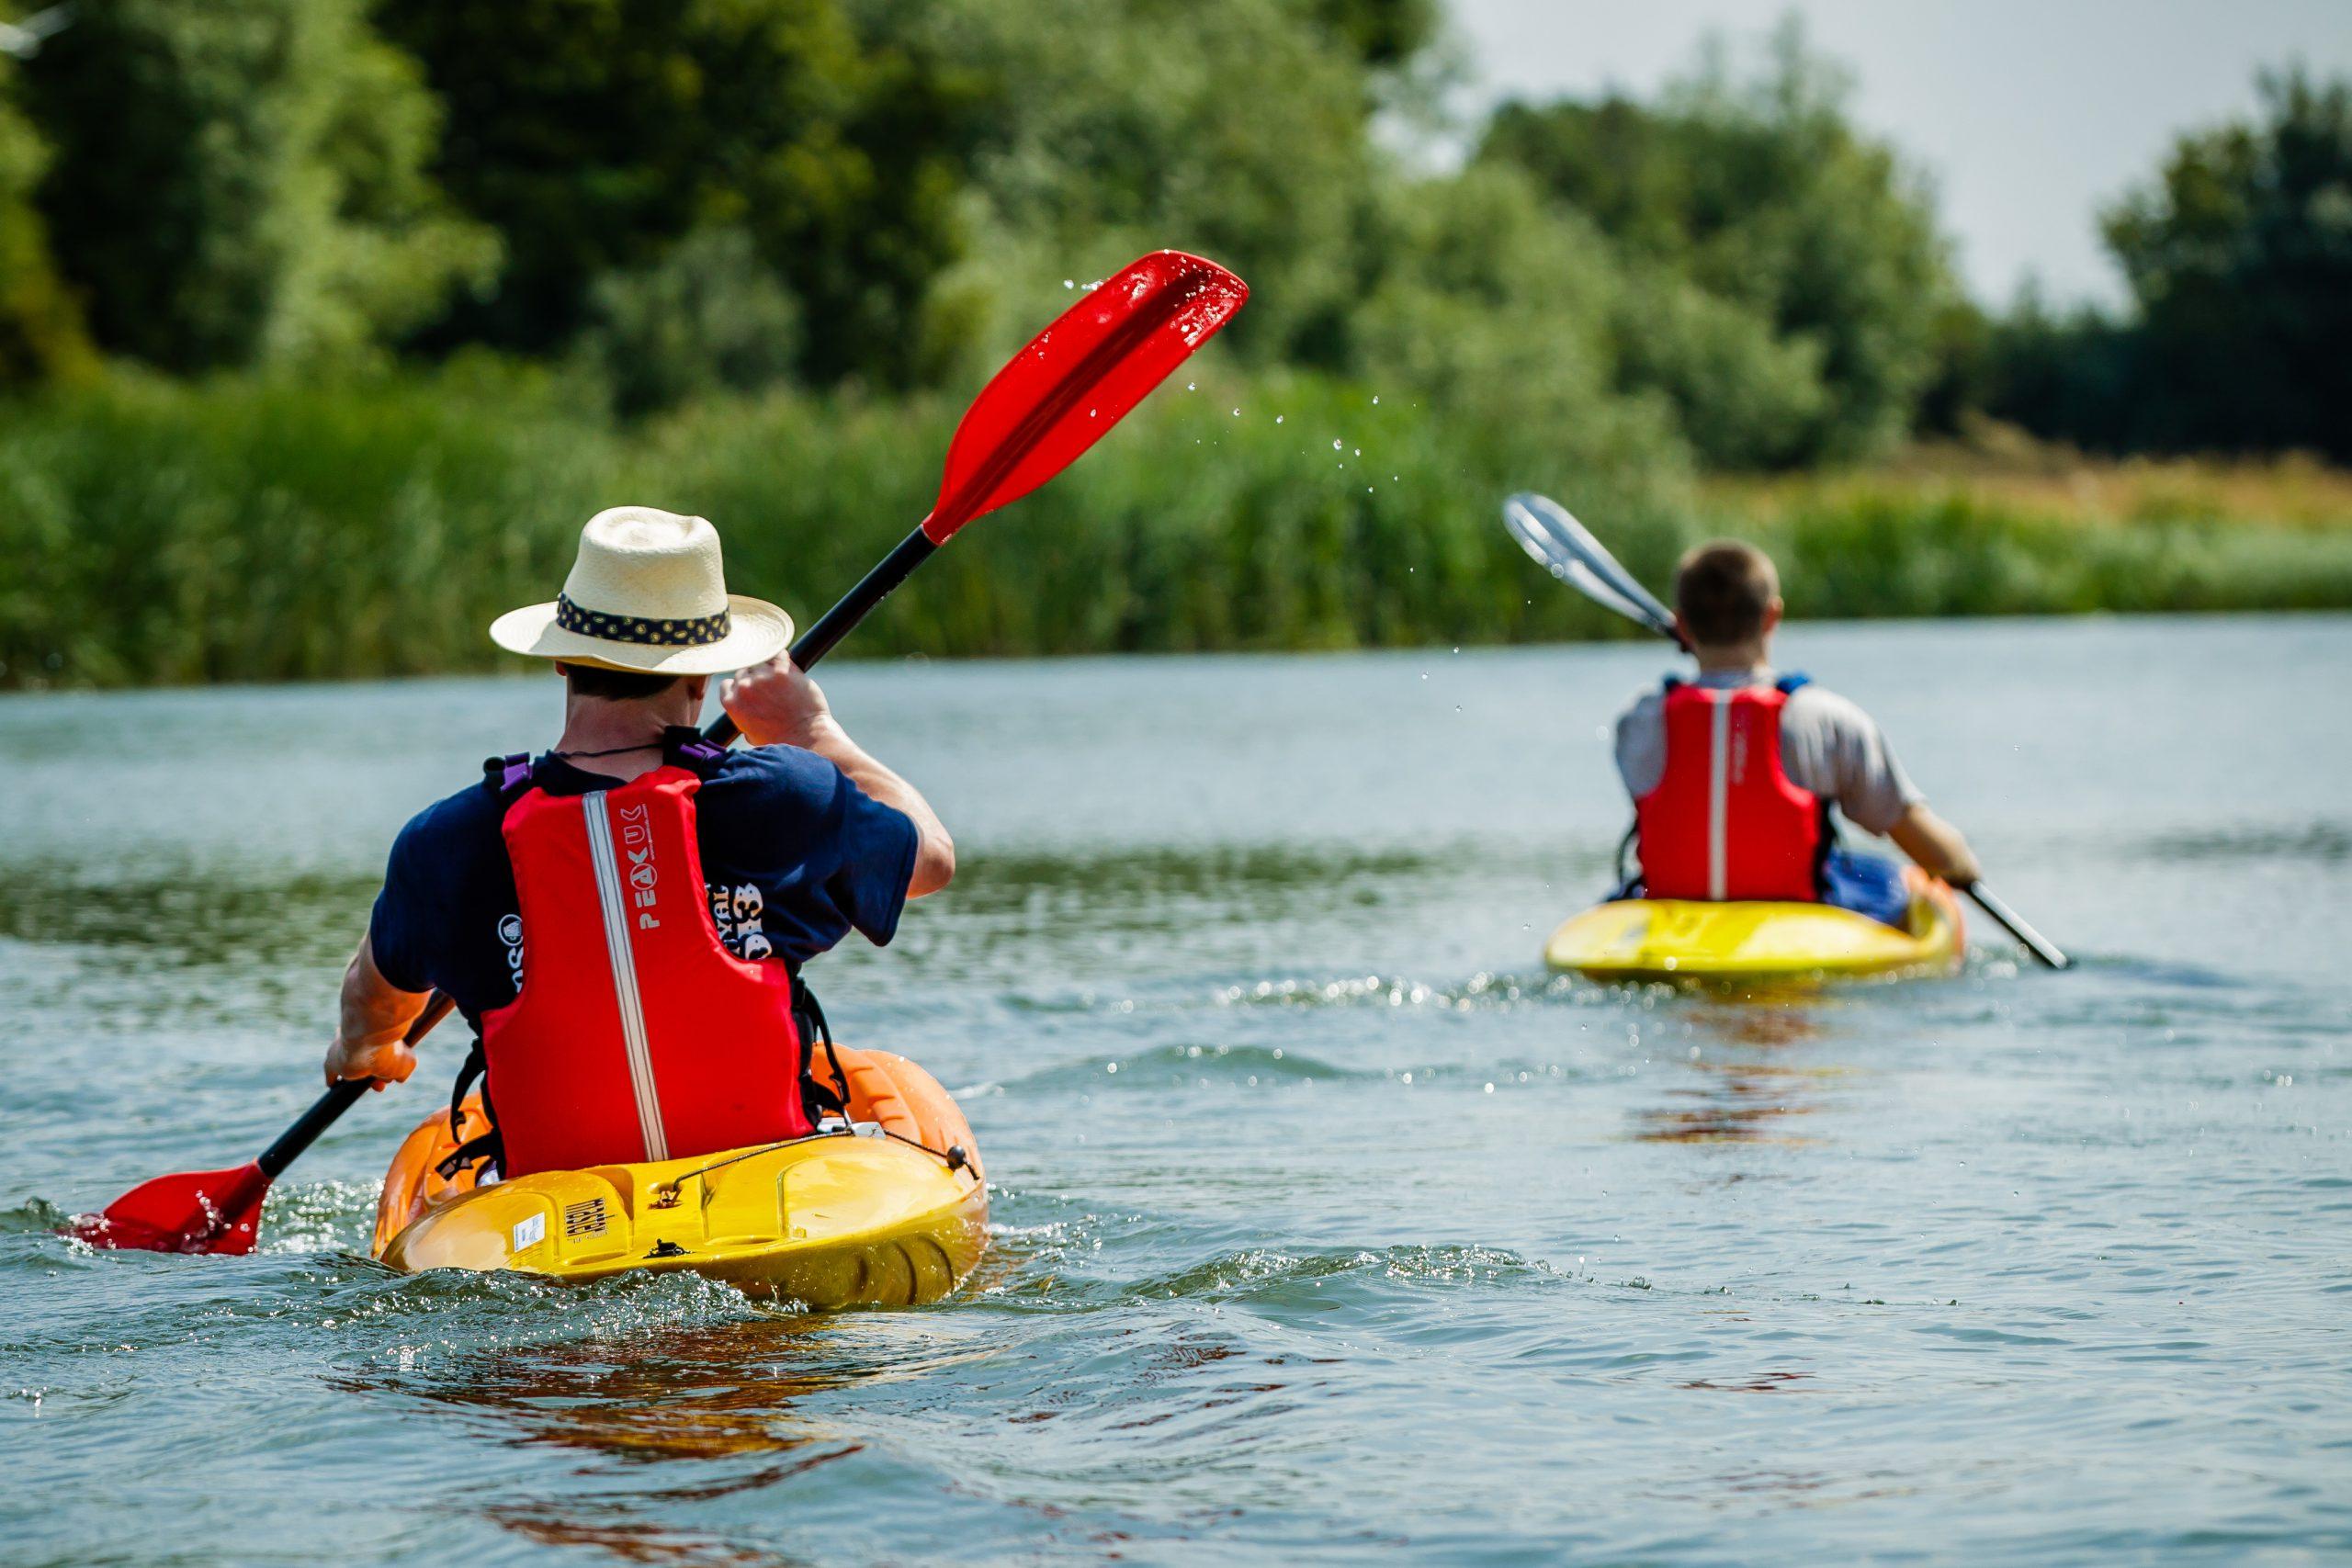 Kayak / Canoe / SUP Hire